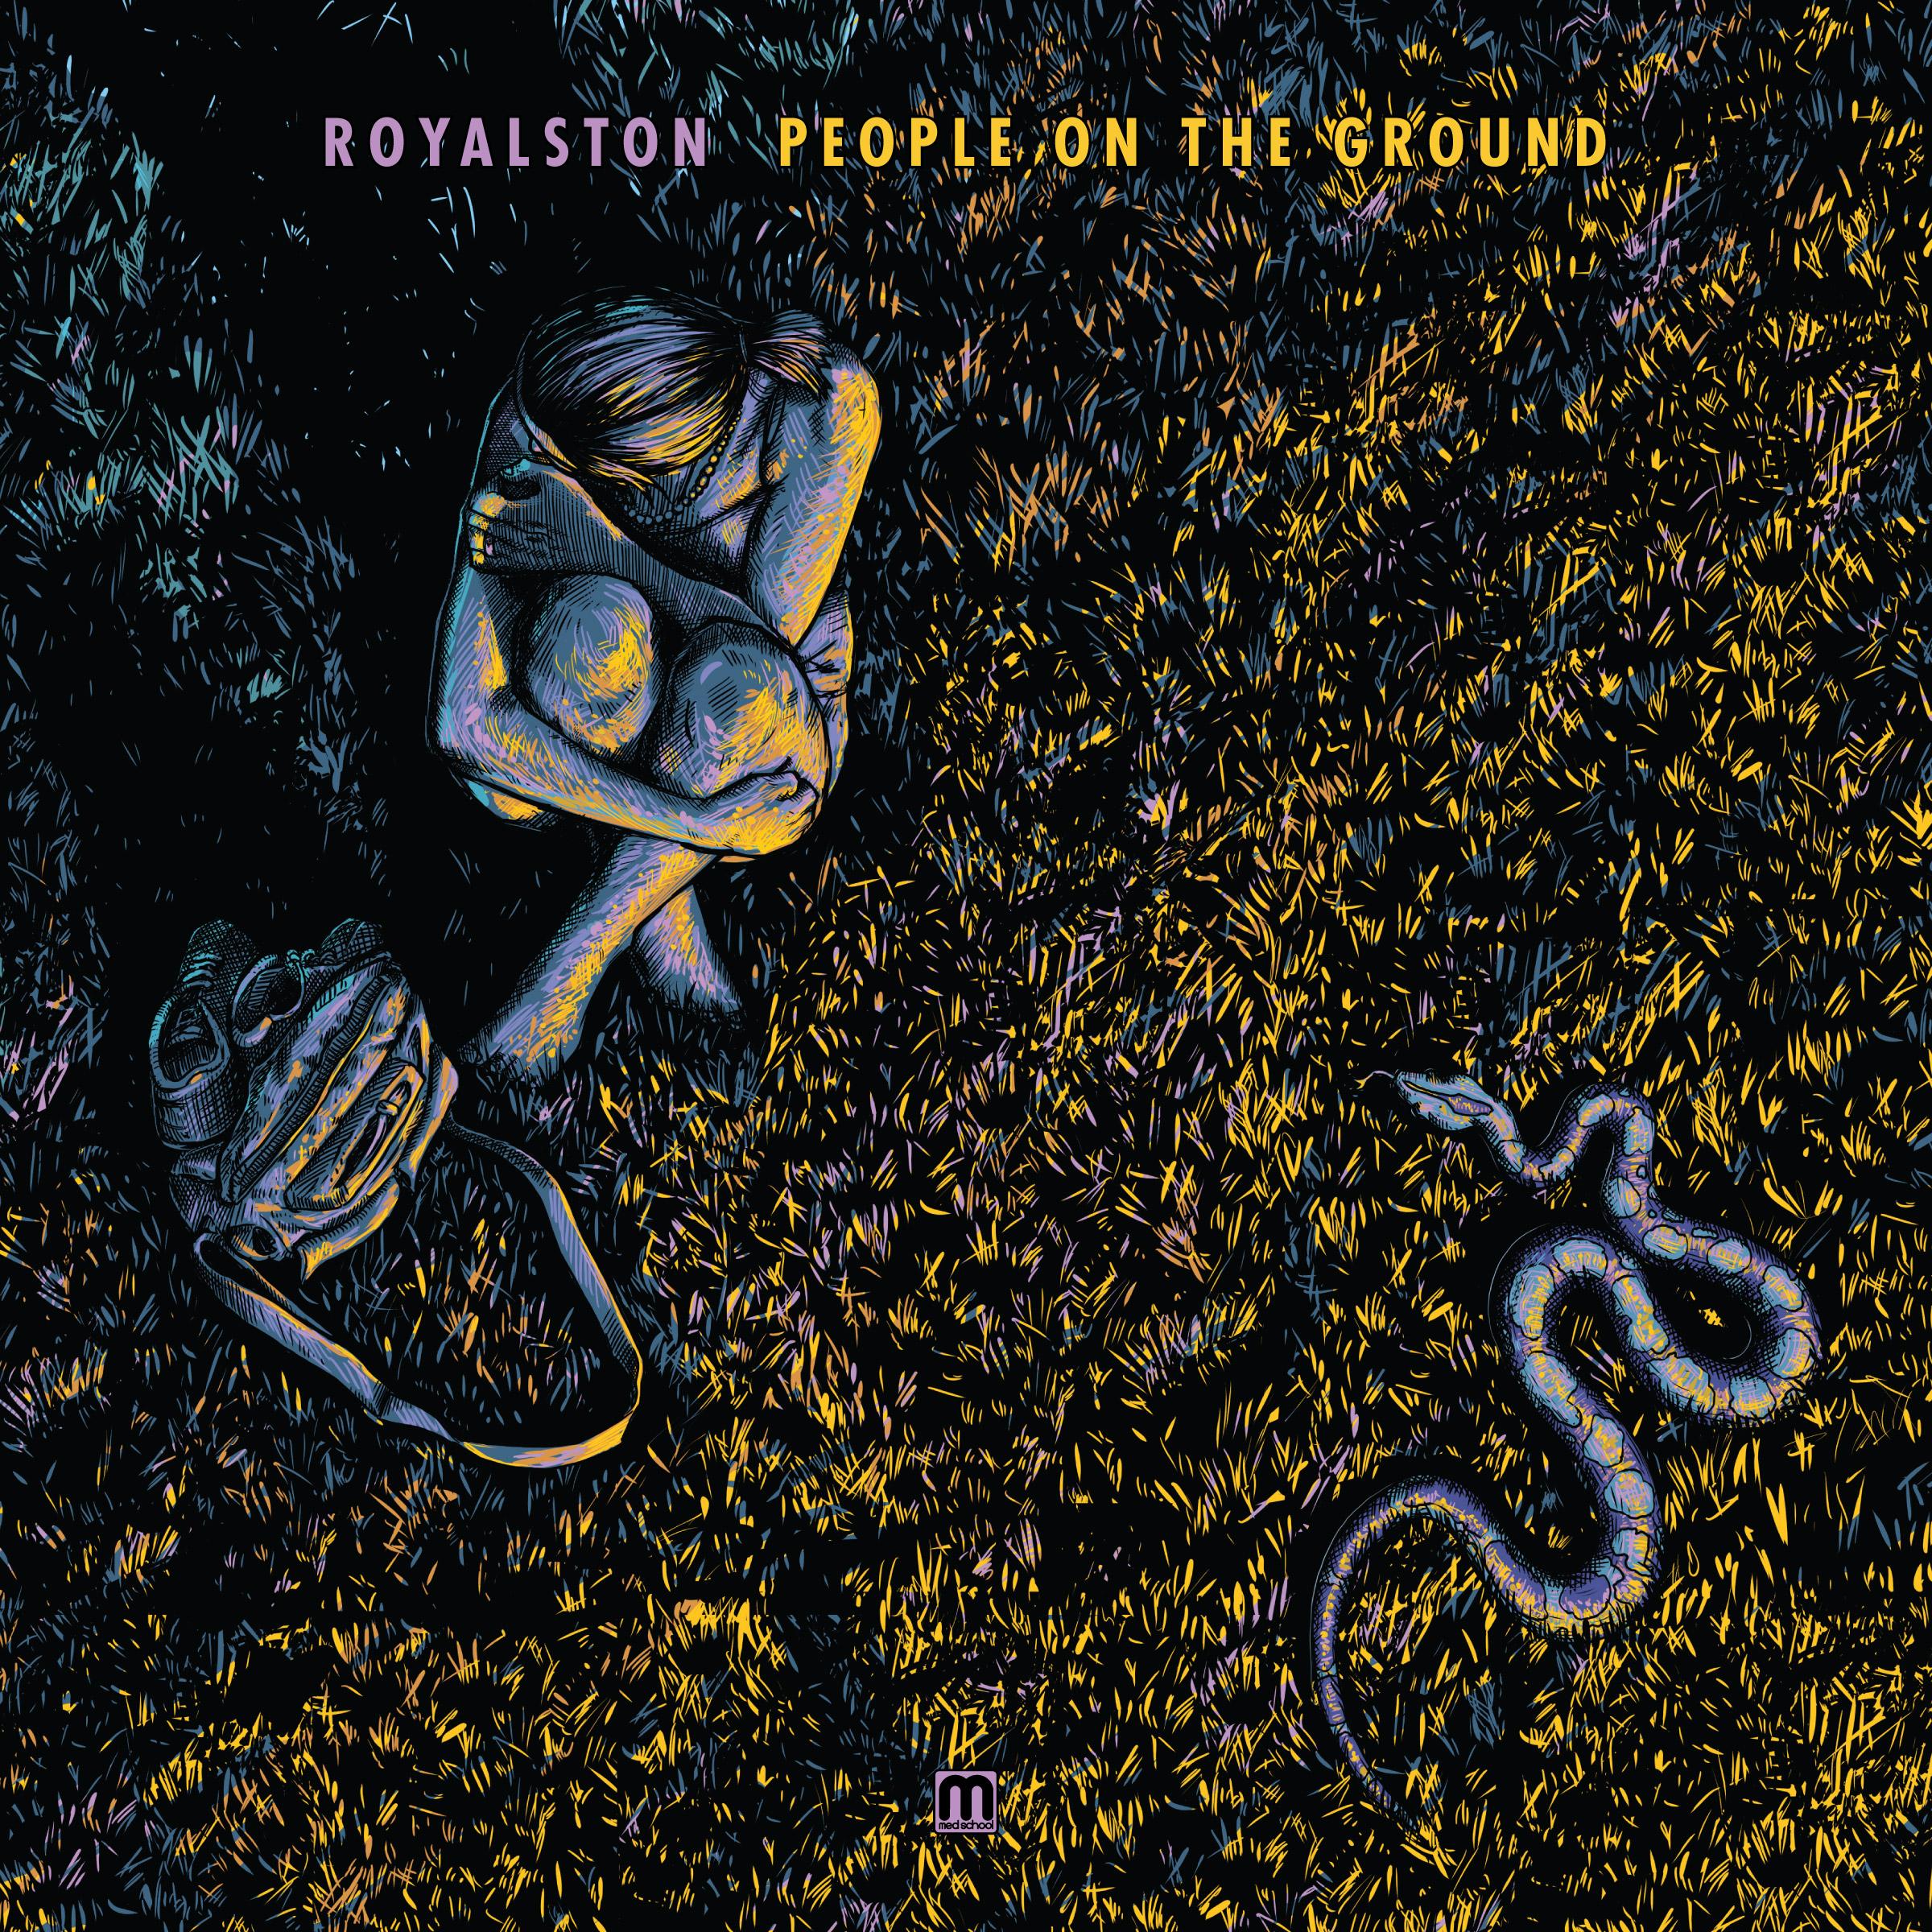 Royalston/PEOPLE ON THE GROUND CD